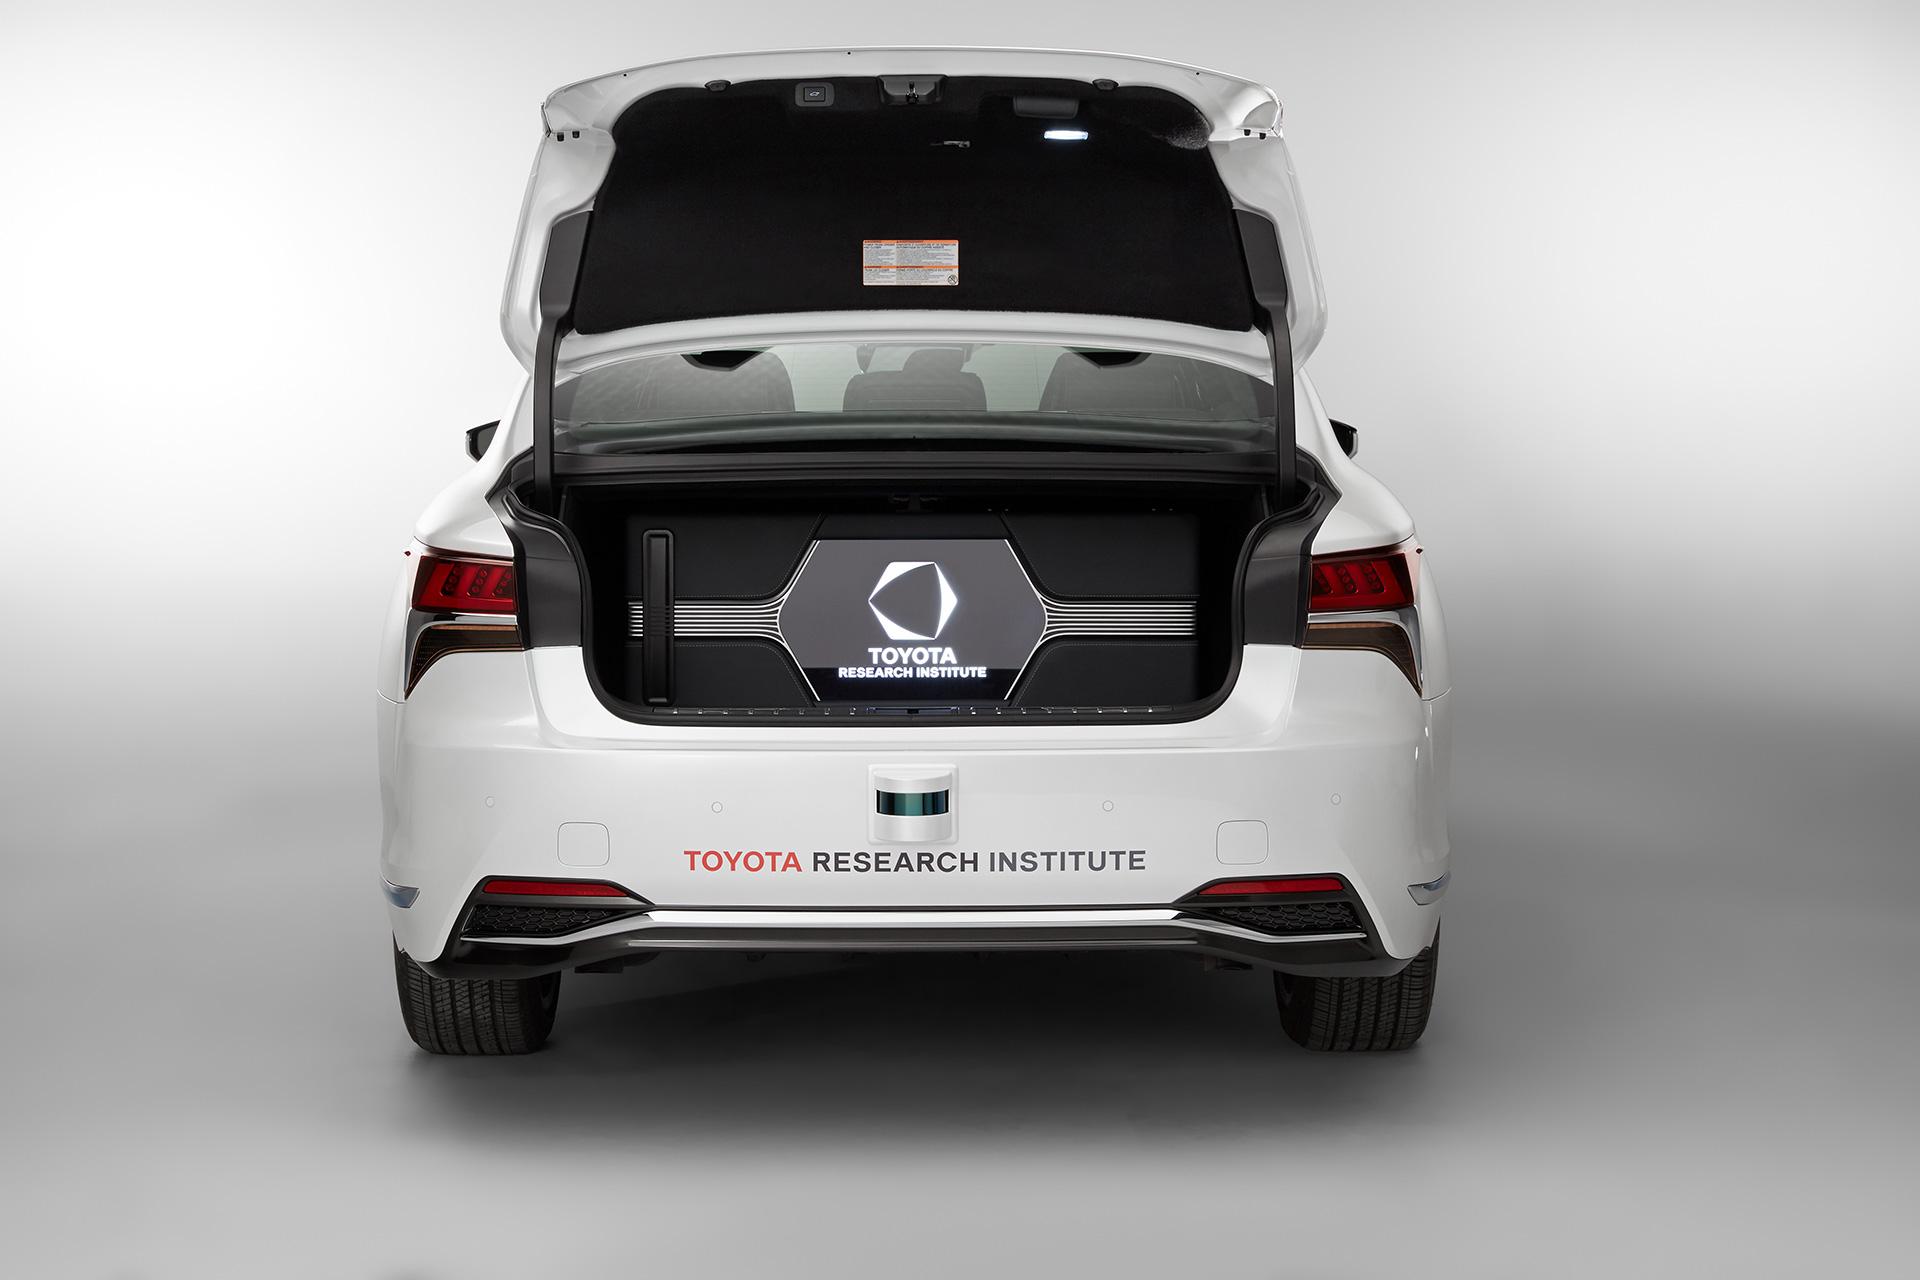 「【CES 2019】新型レクサスLSをベースとした自動運転実験車「TRI-P4」を披露」の11枚目の画像